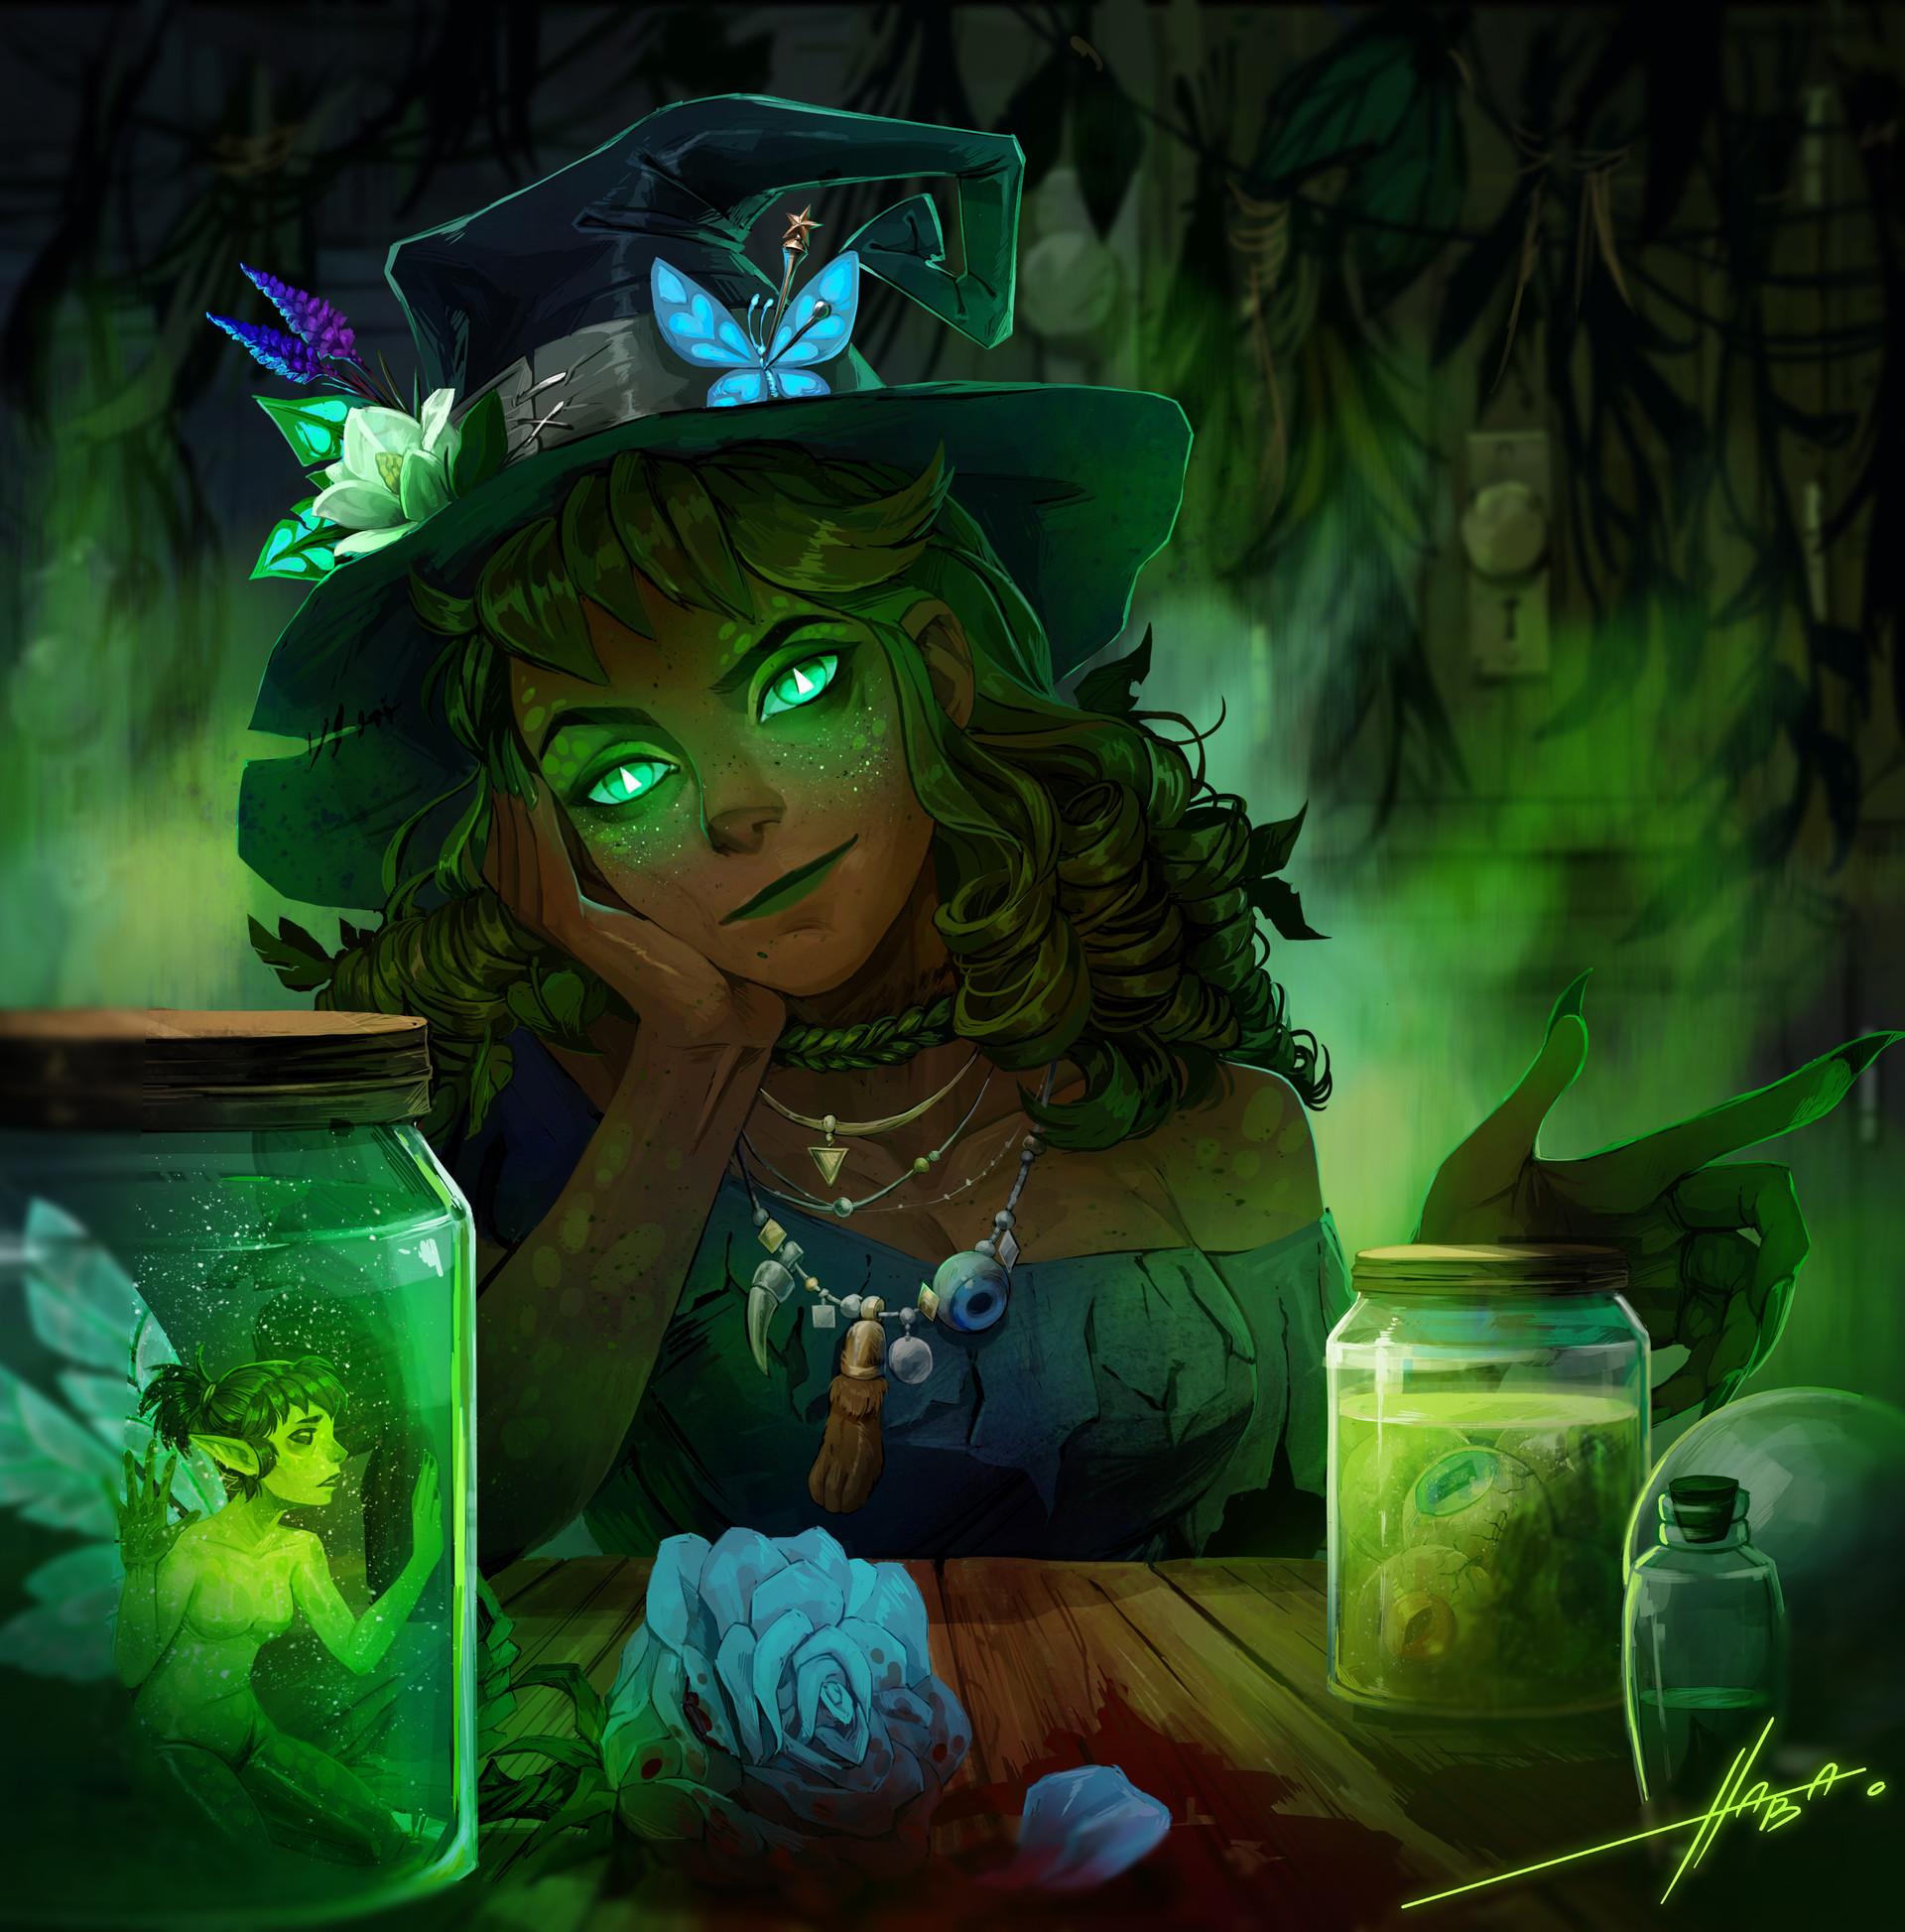 Witch Maggie by Anna Nagibina, A Half Green Hag